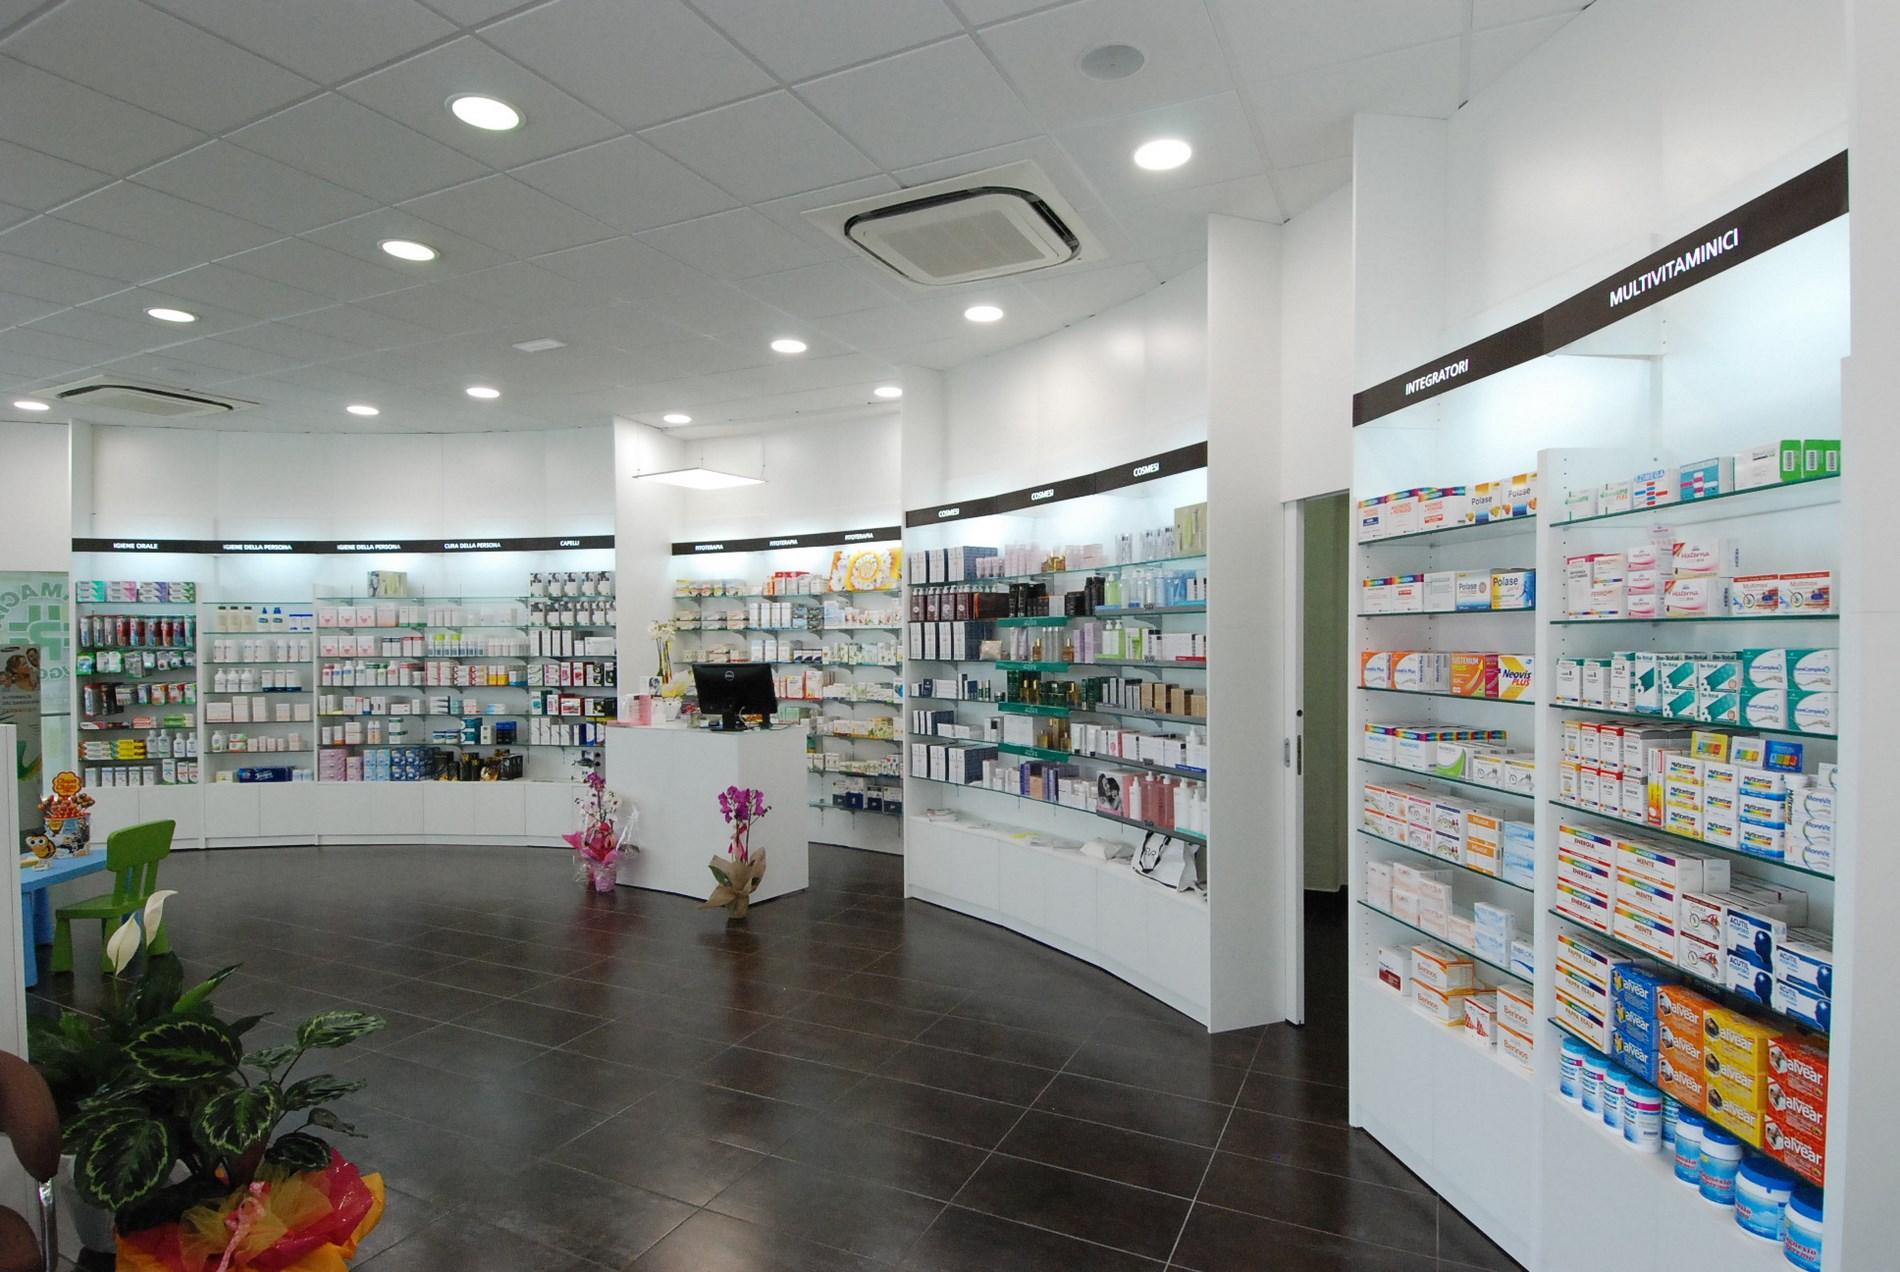 Sebrim sebrim arredo farmacie parafarmacie studi for Arredamento parafarmacia usato